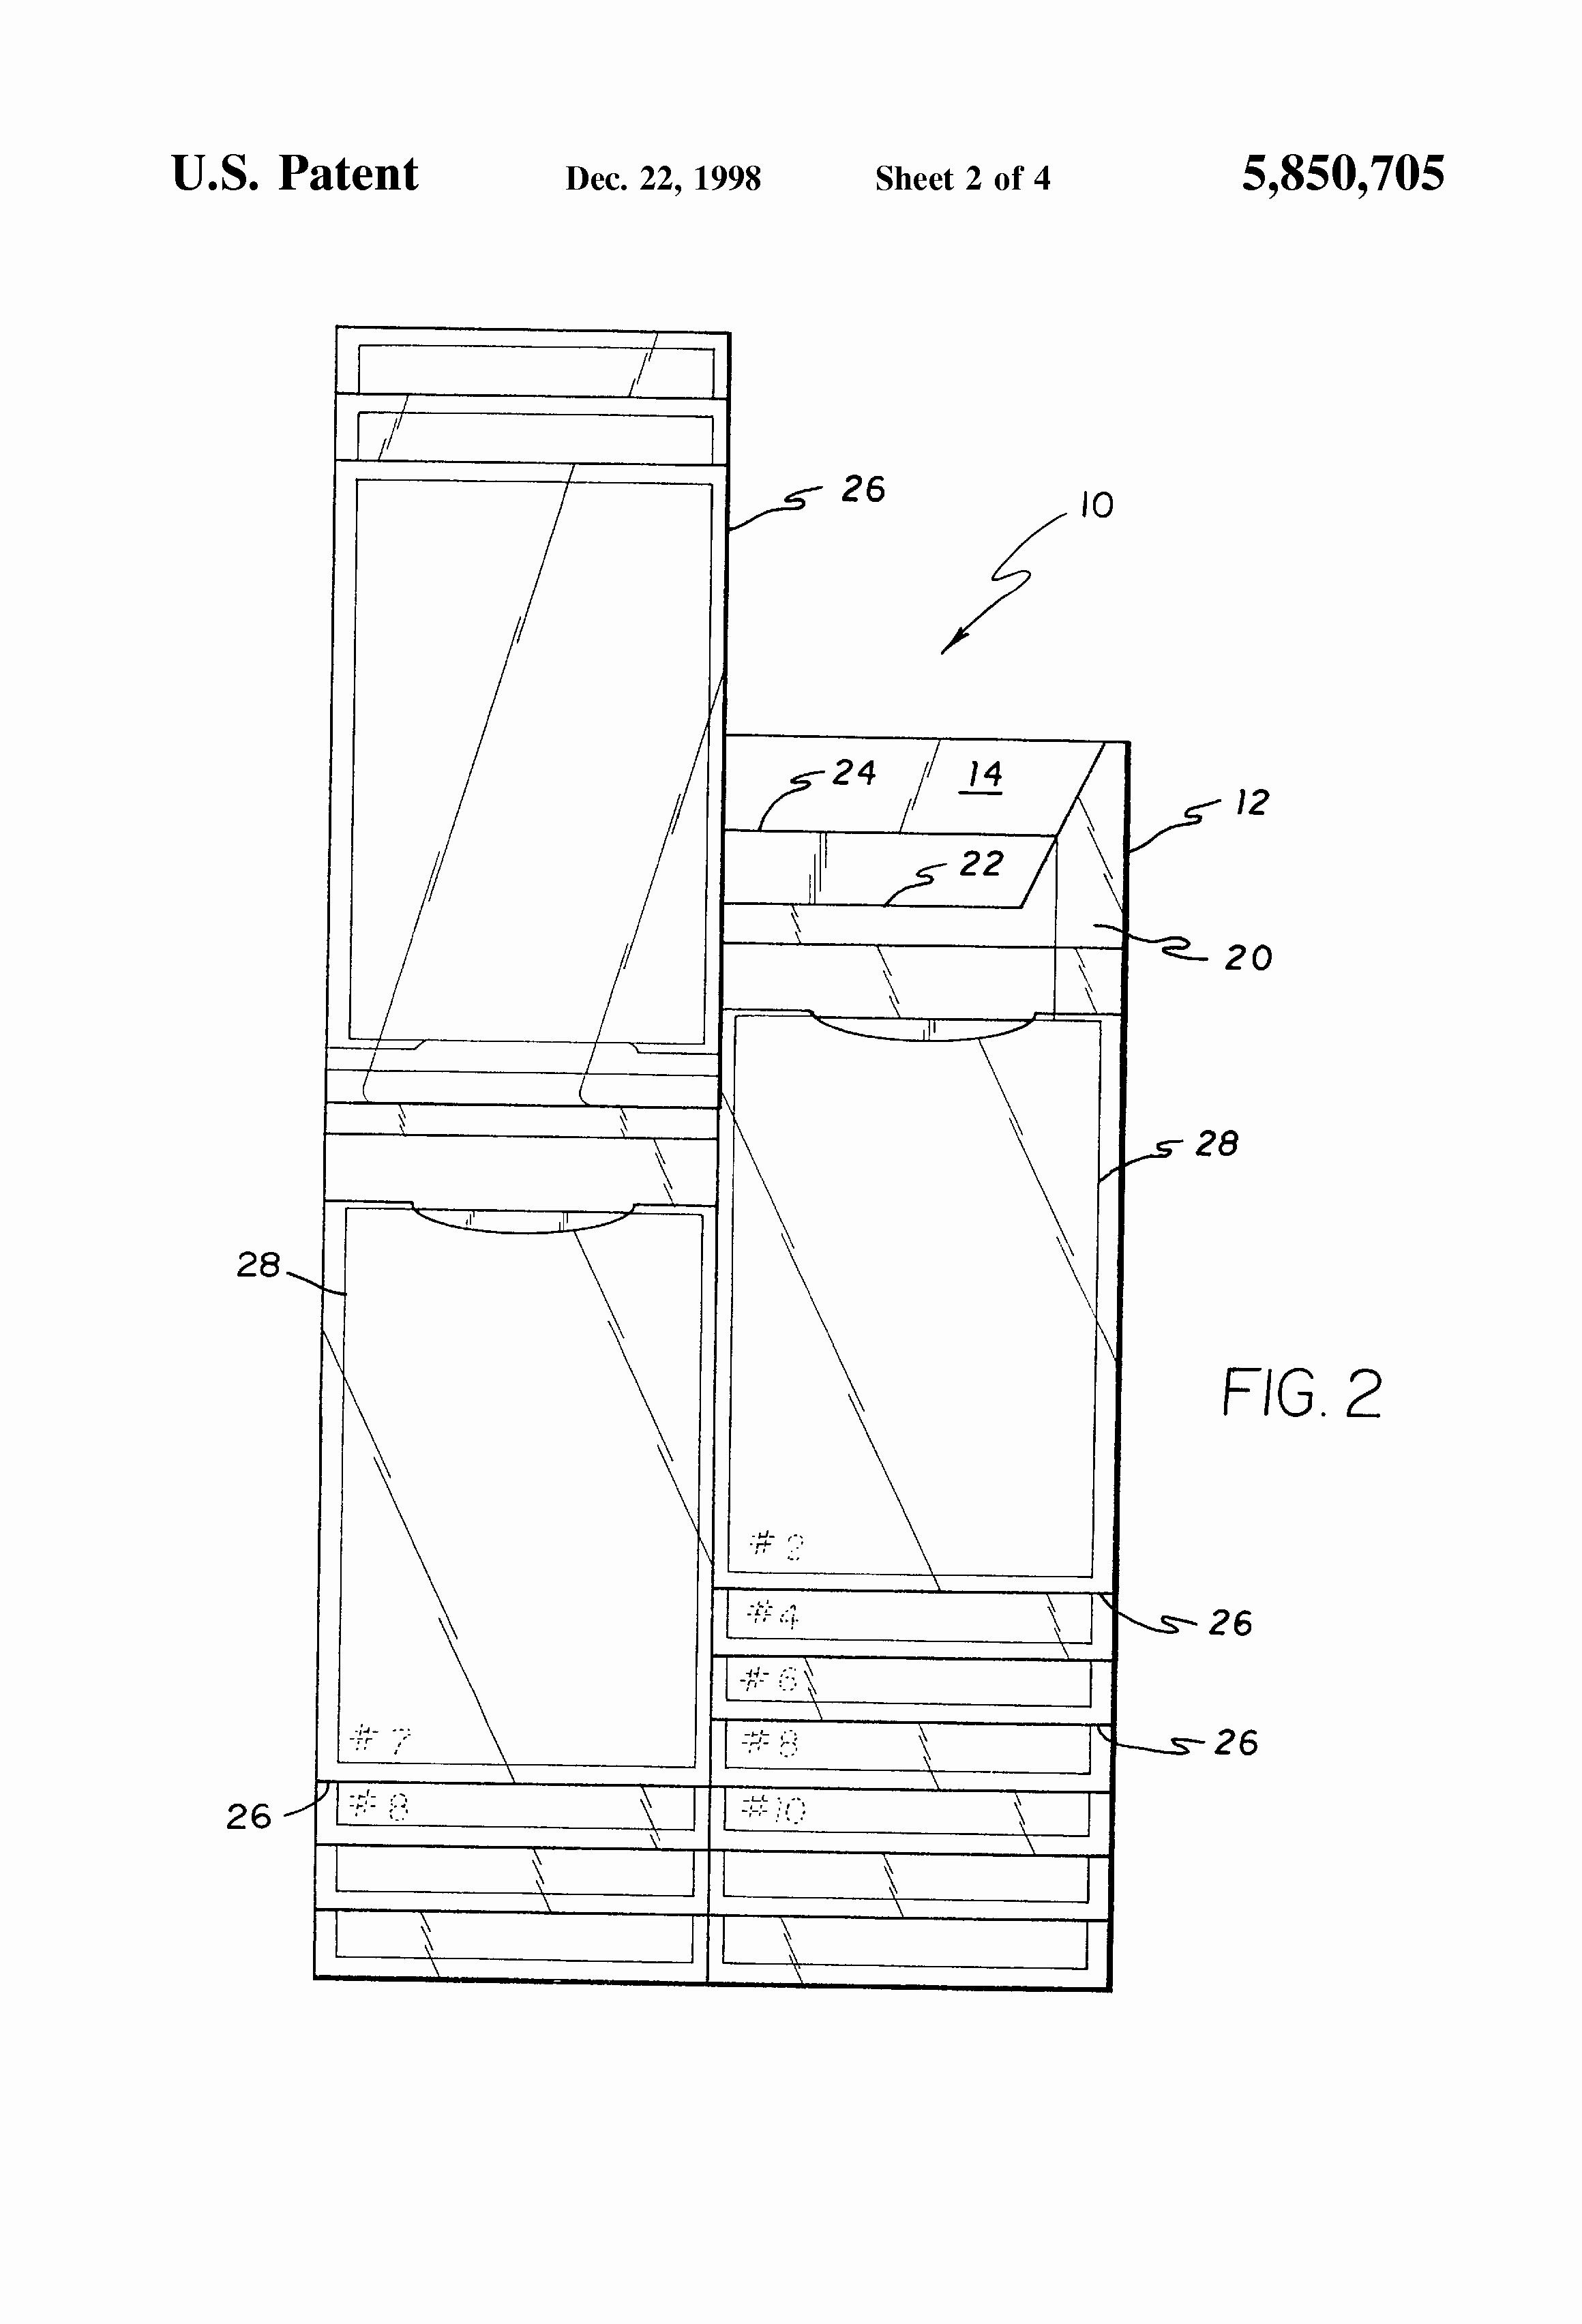 Printable Circuit Breaker Directory Elegant Patent Us Circuit Directory for Electric Panels